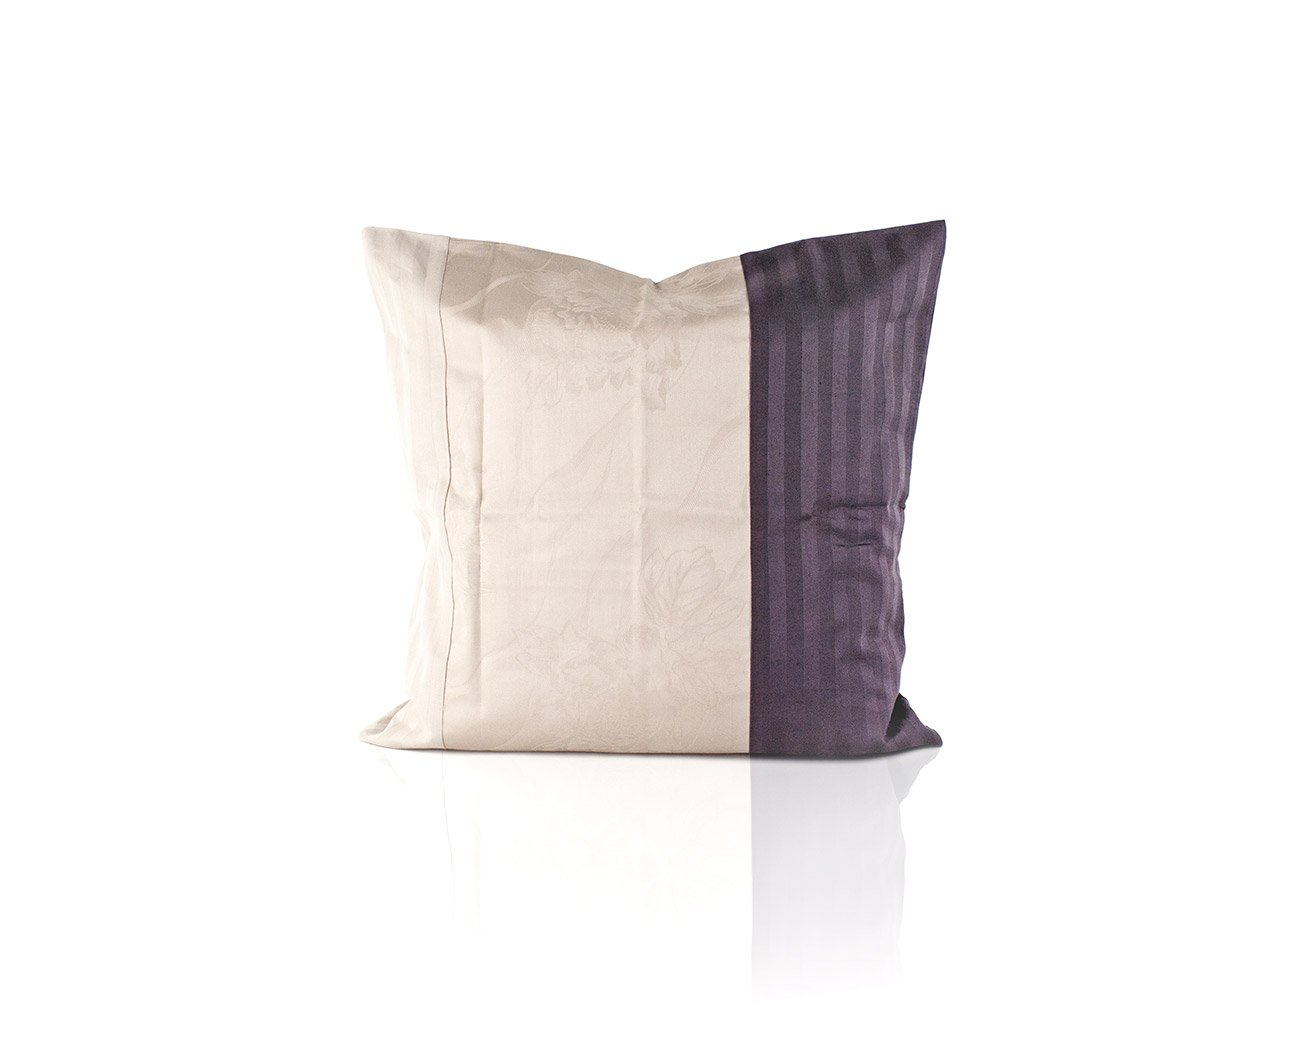 Наволочка из страйп-сатина Полоска 1x1 комби-4 серо-фиолетовый Elin